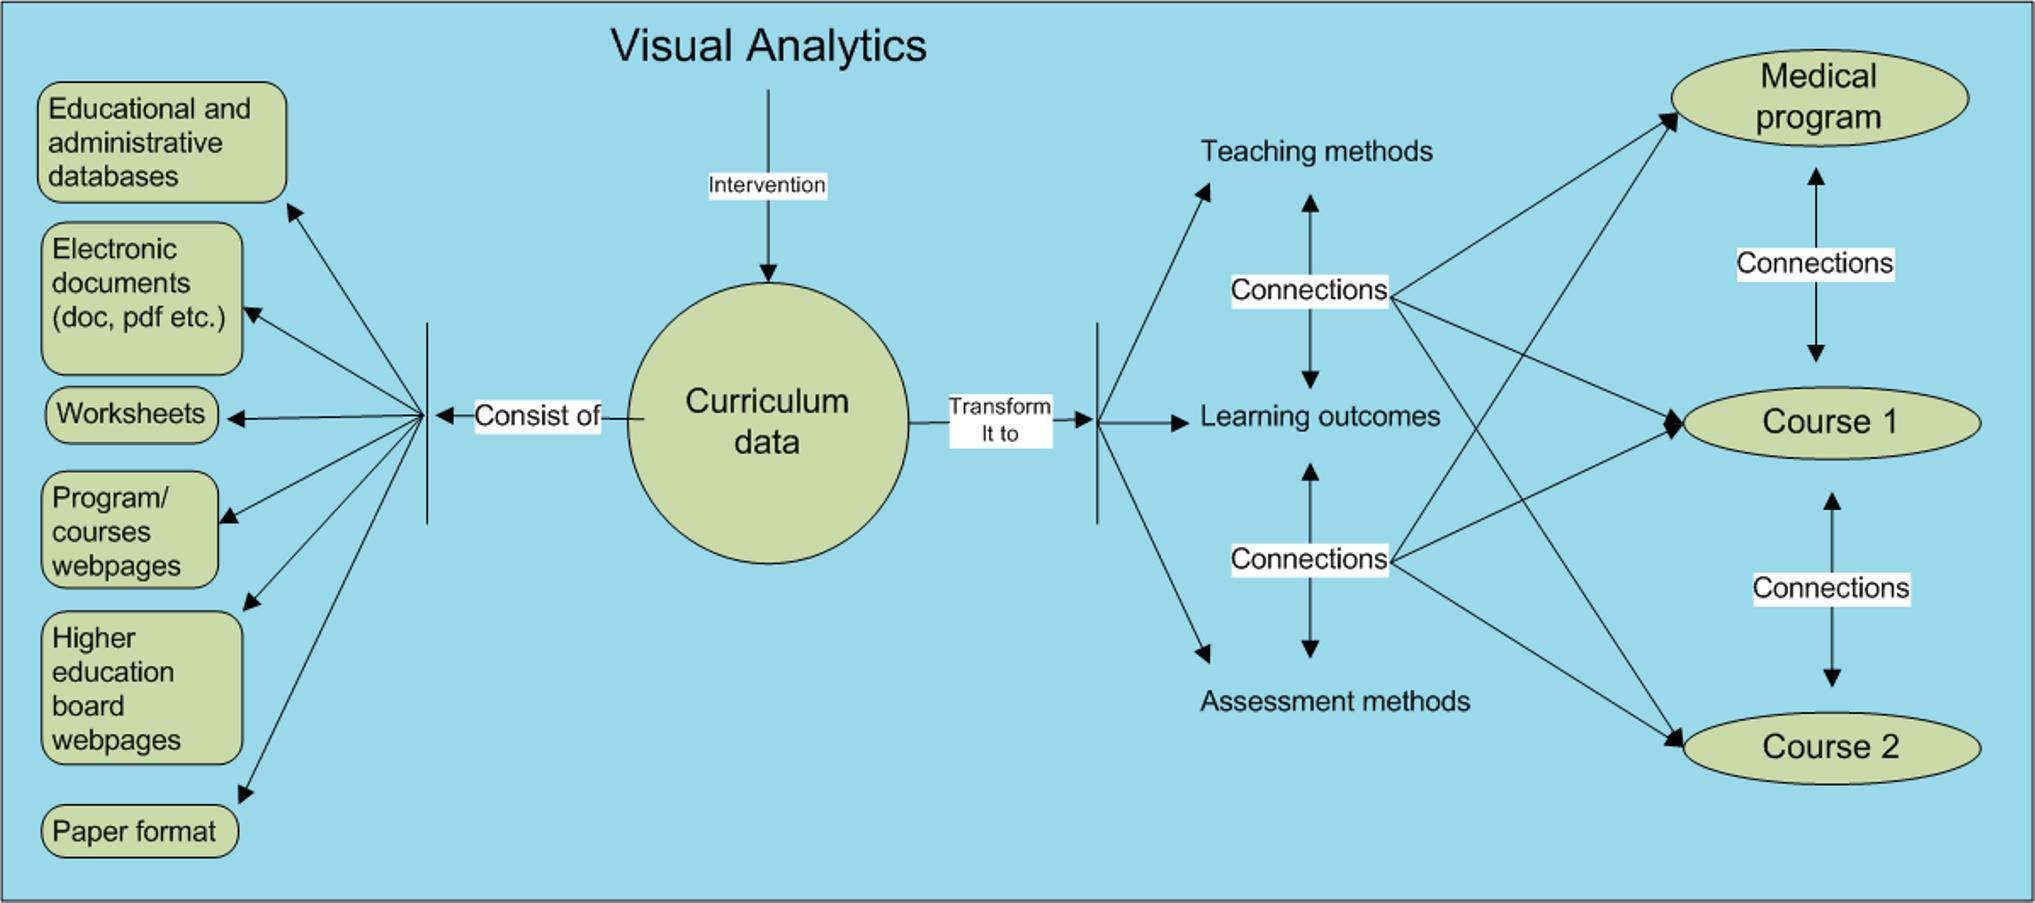 Visual analytics in healthcare education: exploring novel ways to ...